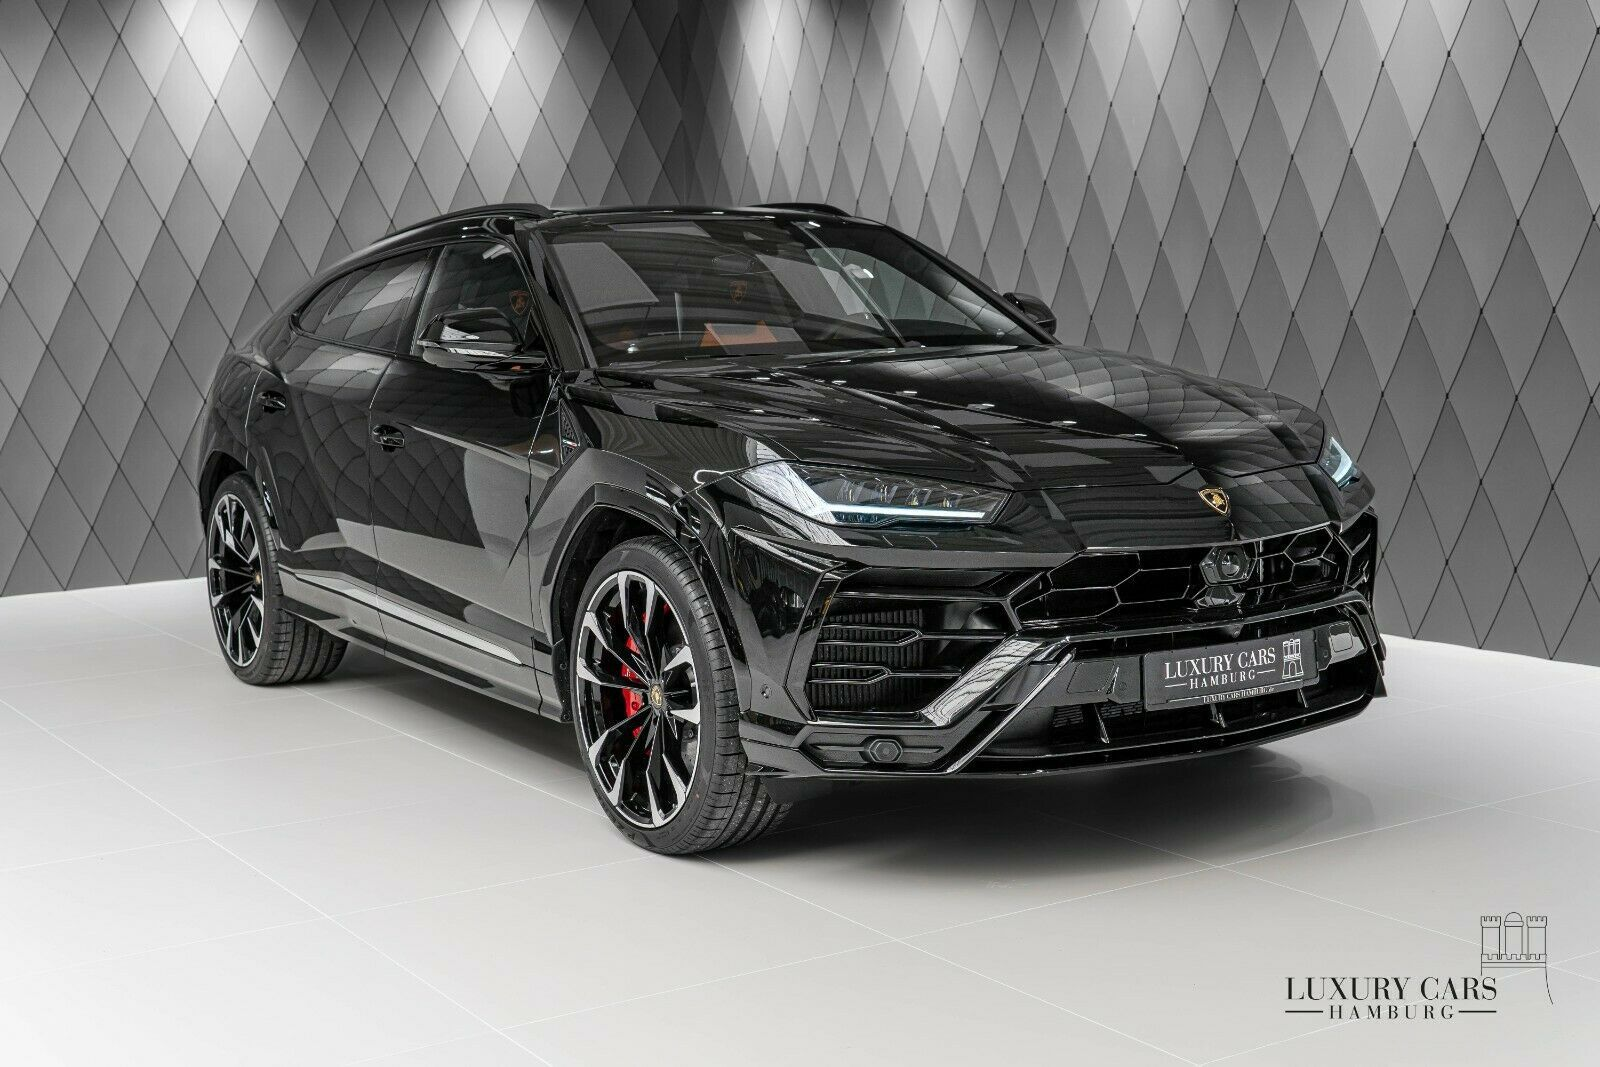 For Sale 2020 Lamborghini Urus Luxury Cars Hamburg Germany For Sale On Luxurypulse Tuner Cars Lamborghini Luxury Cars